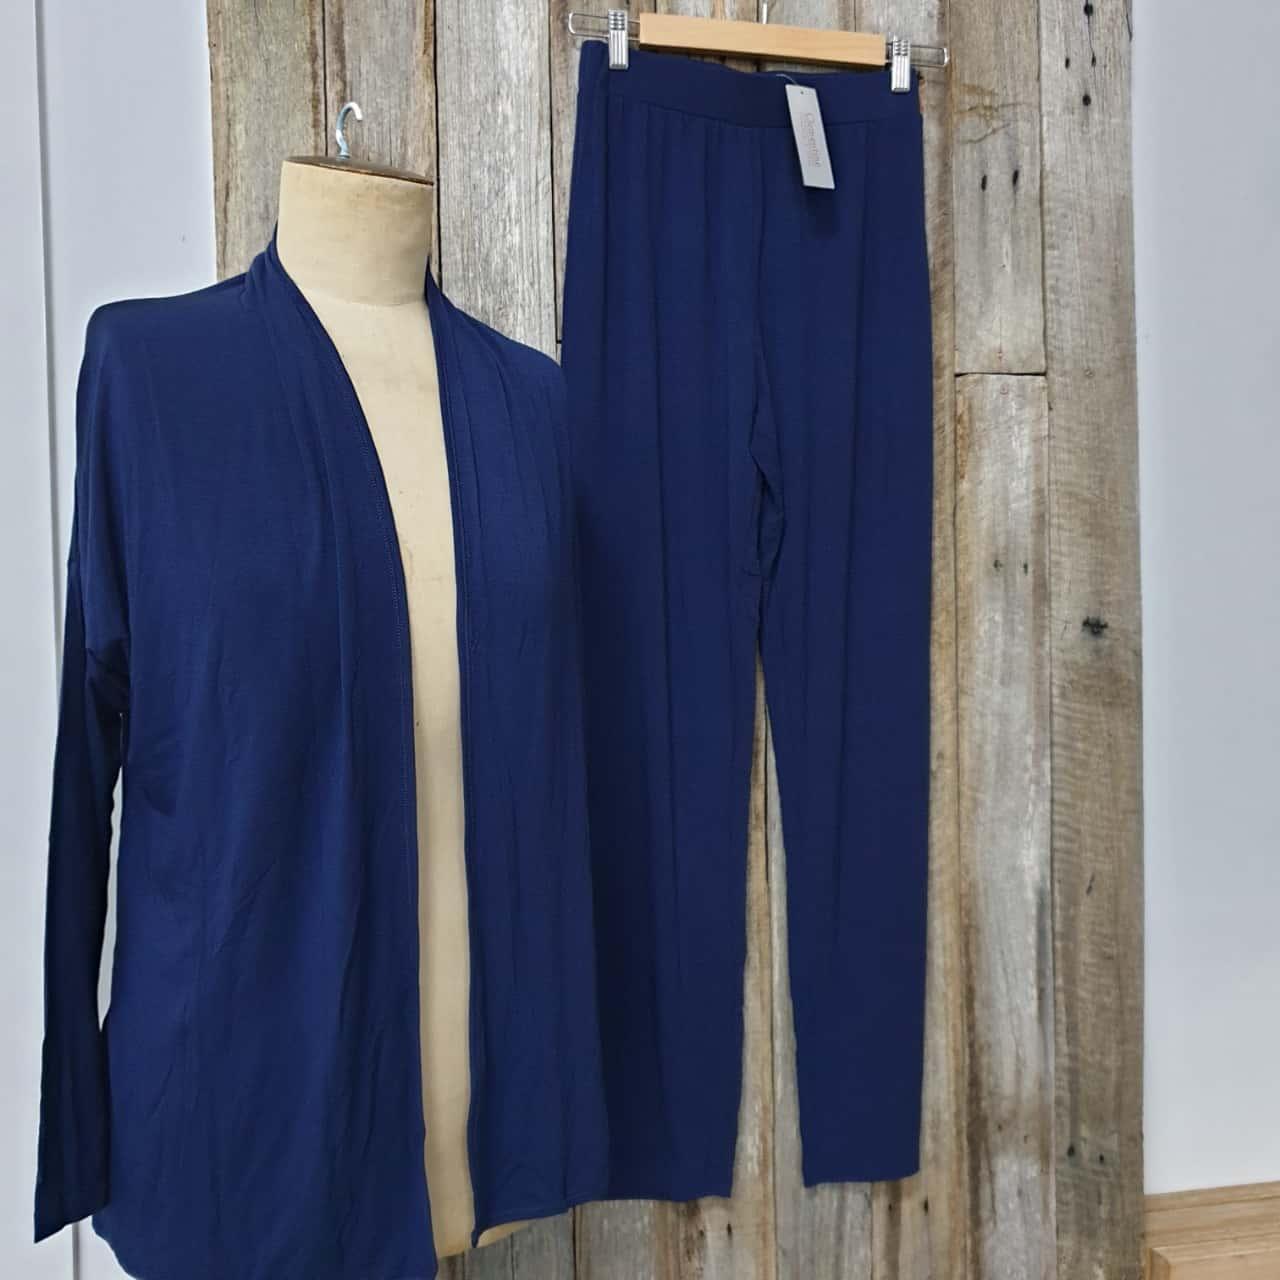 Women's Clementine, New Pyjamas, Bamboo Blend Navy Blue, Size S